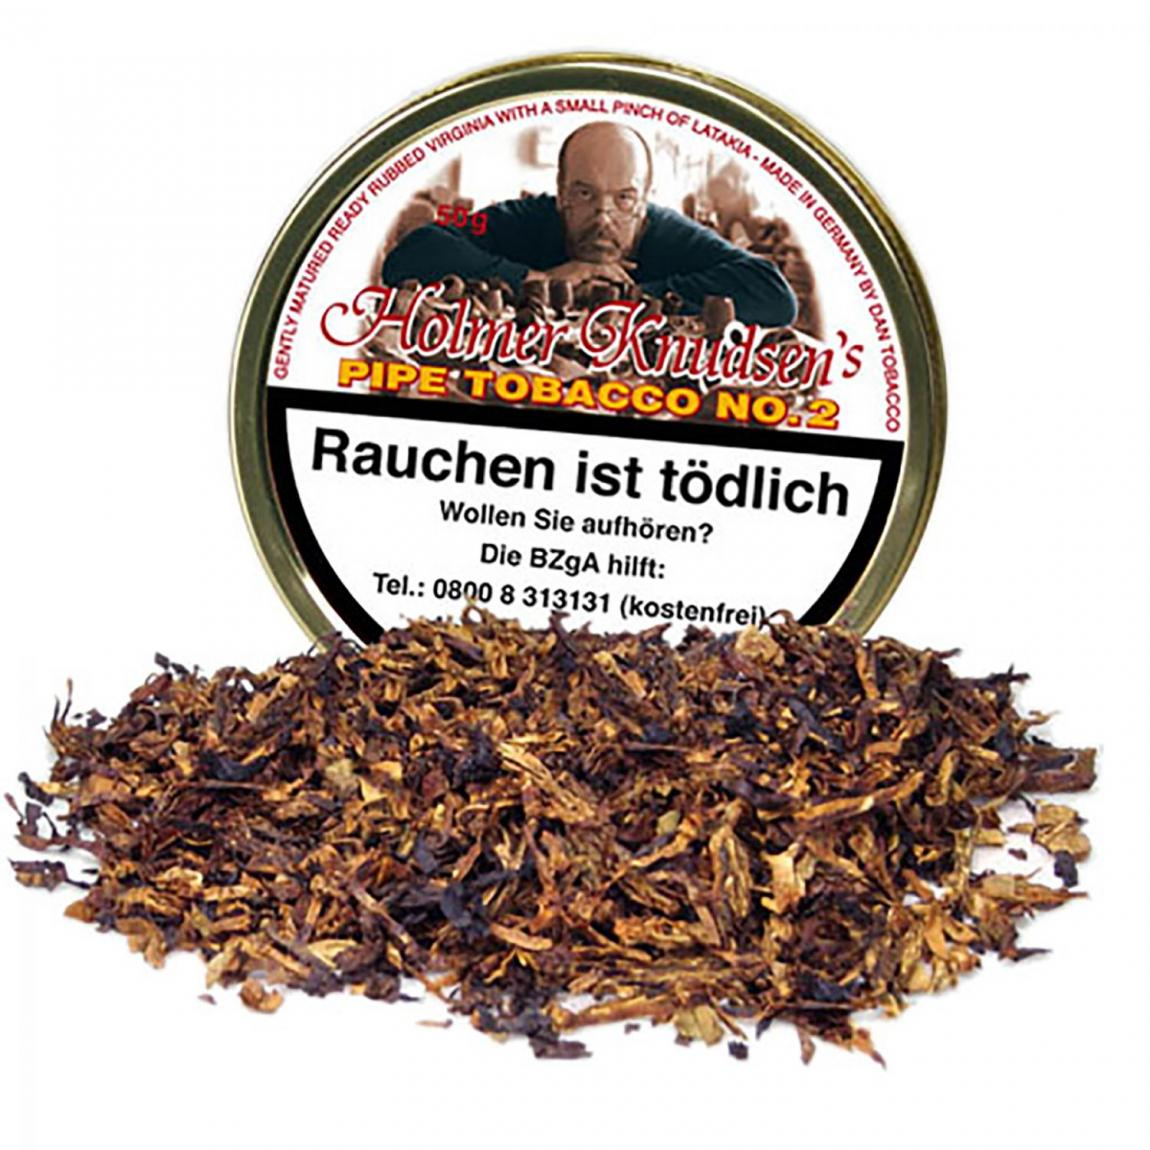 Holmer Knudsen's Pipe Tobacco No.2 50g Dose